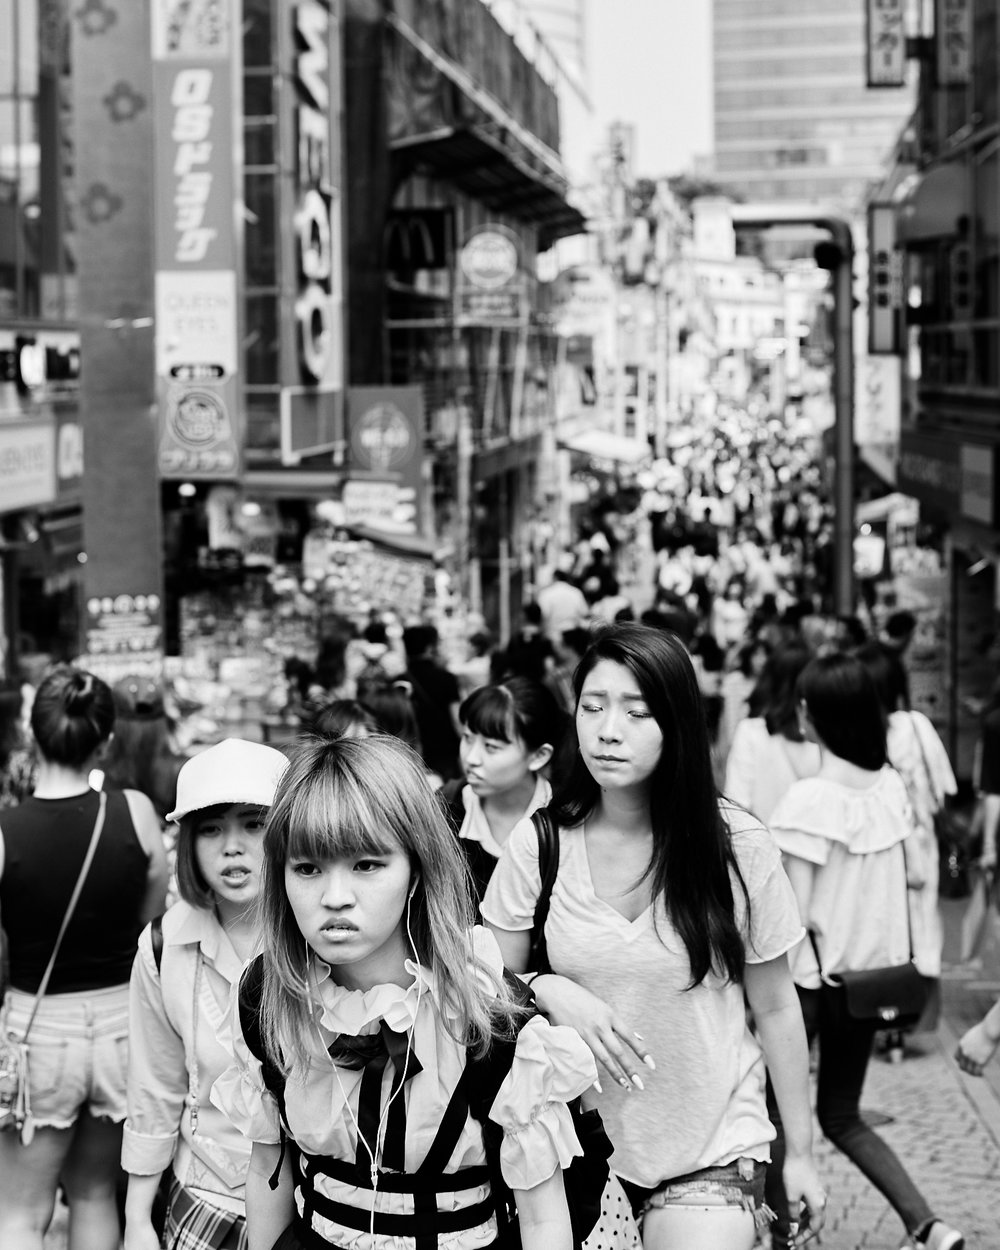 SnapPilots_17-07-05_Tokyo2017_bnw_79.jpg